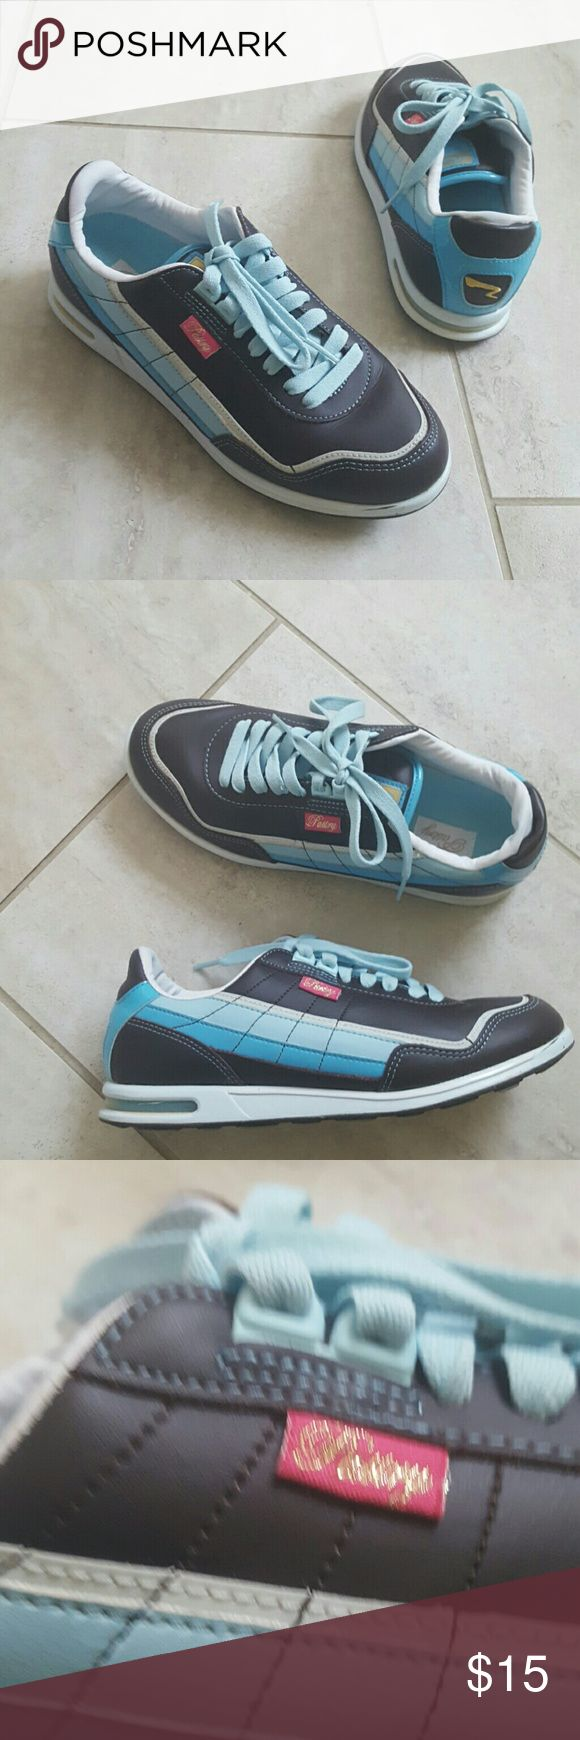 Chocolate brown, sky blue sneakers Chocolate brown, sky blue sneakers pastry Shoes Sneakers